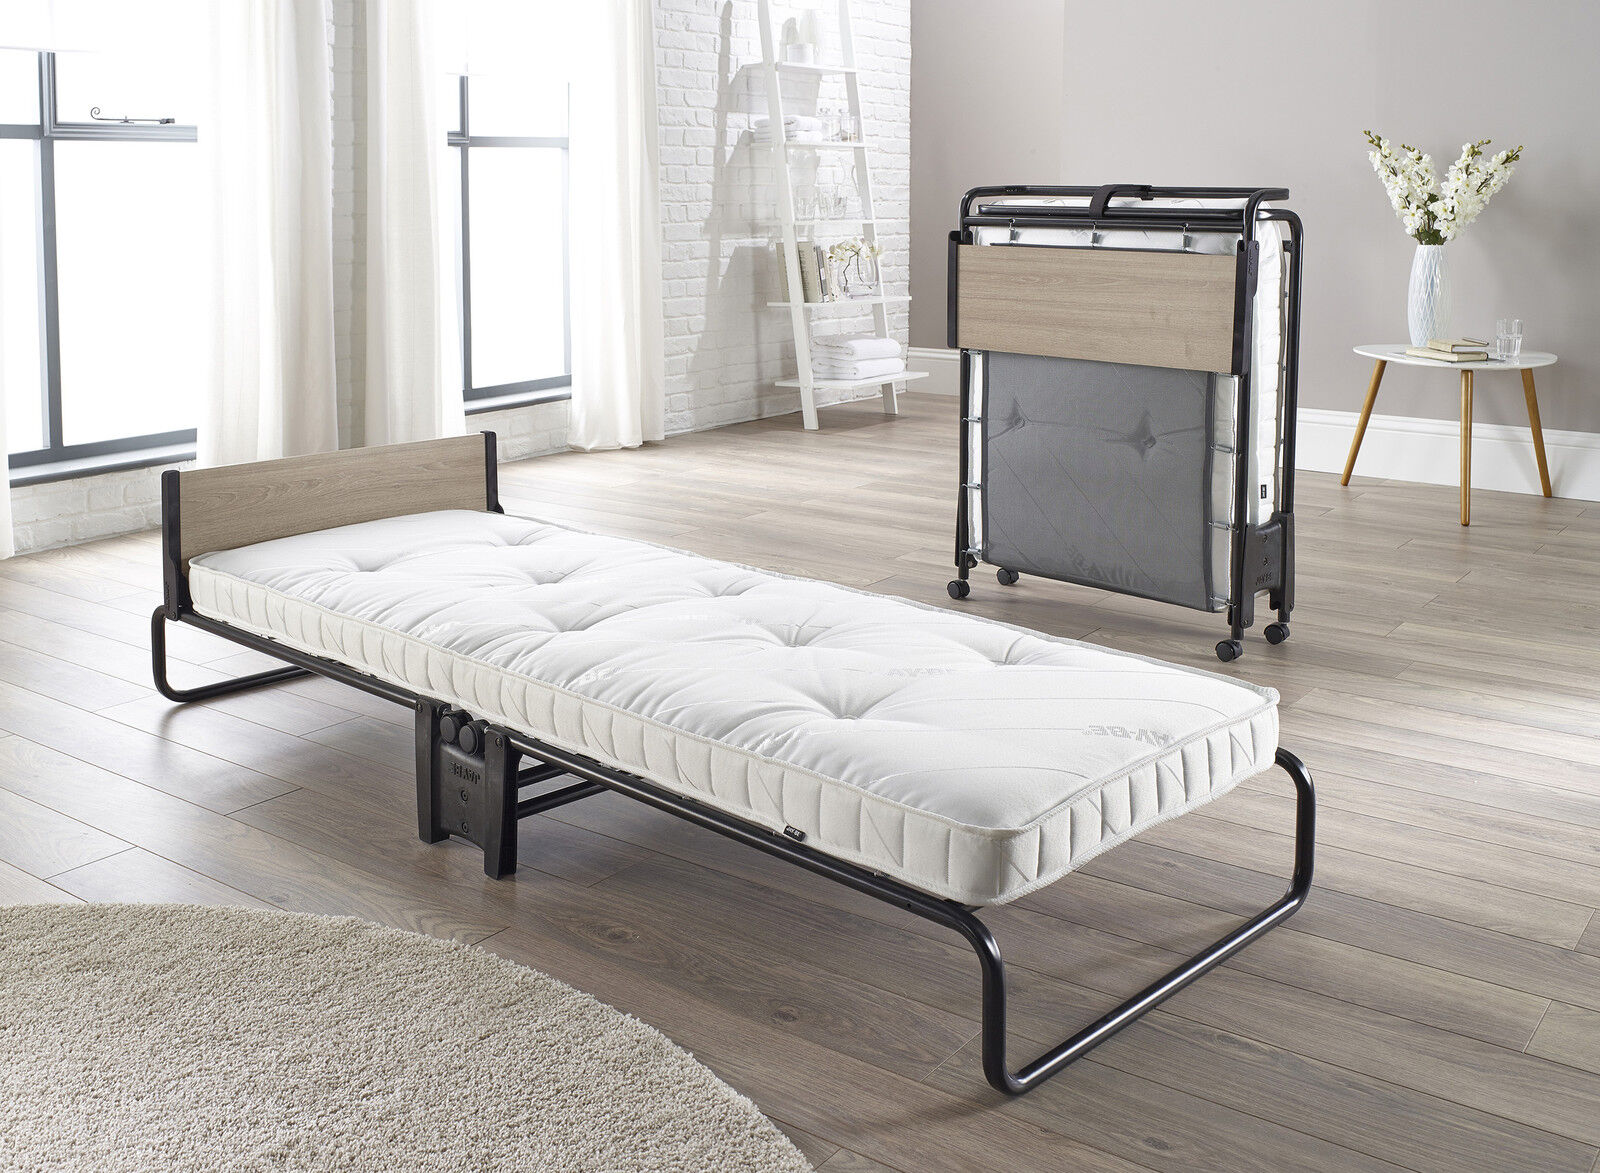 canada folding ip guest sensations spa size en one white bed walmart